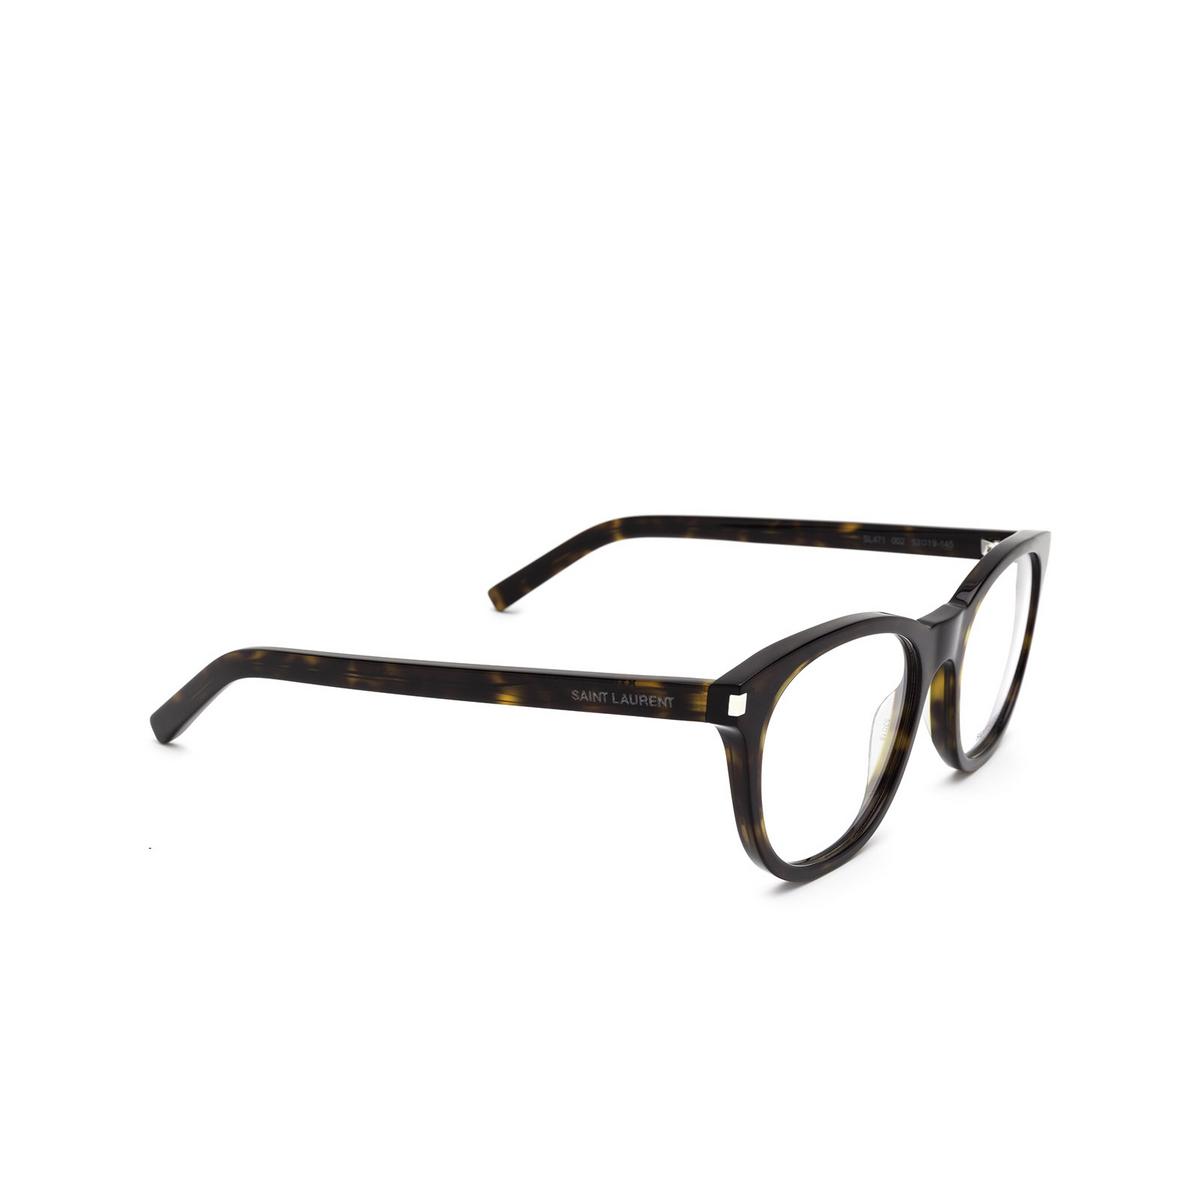 Saint Laurent® Square Eyeglasses: SL 471 color Havana 002 - three-quarters view.